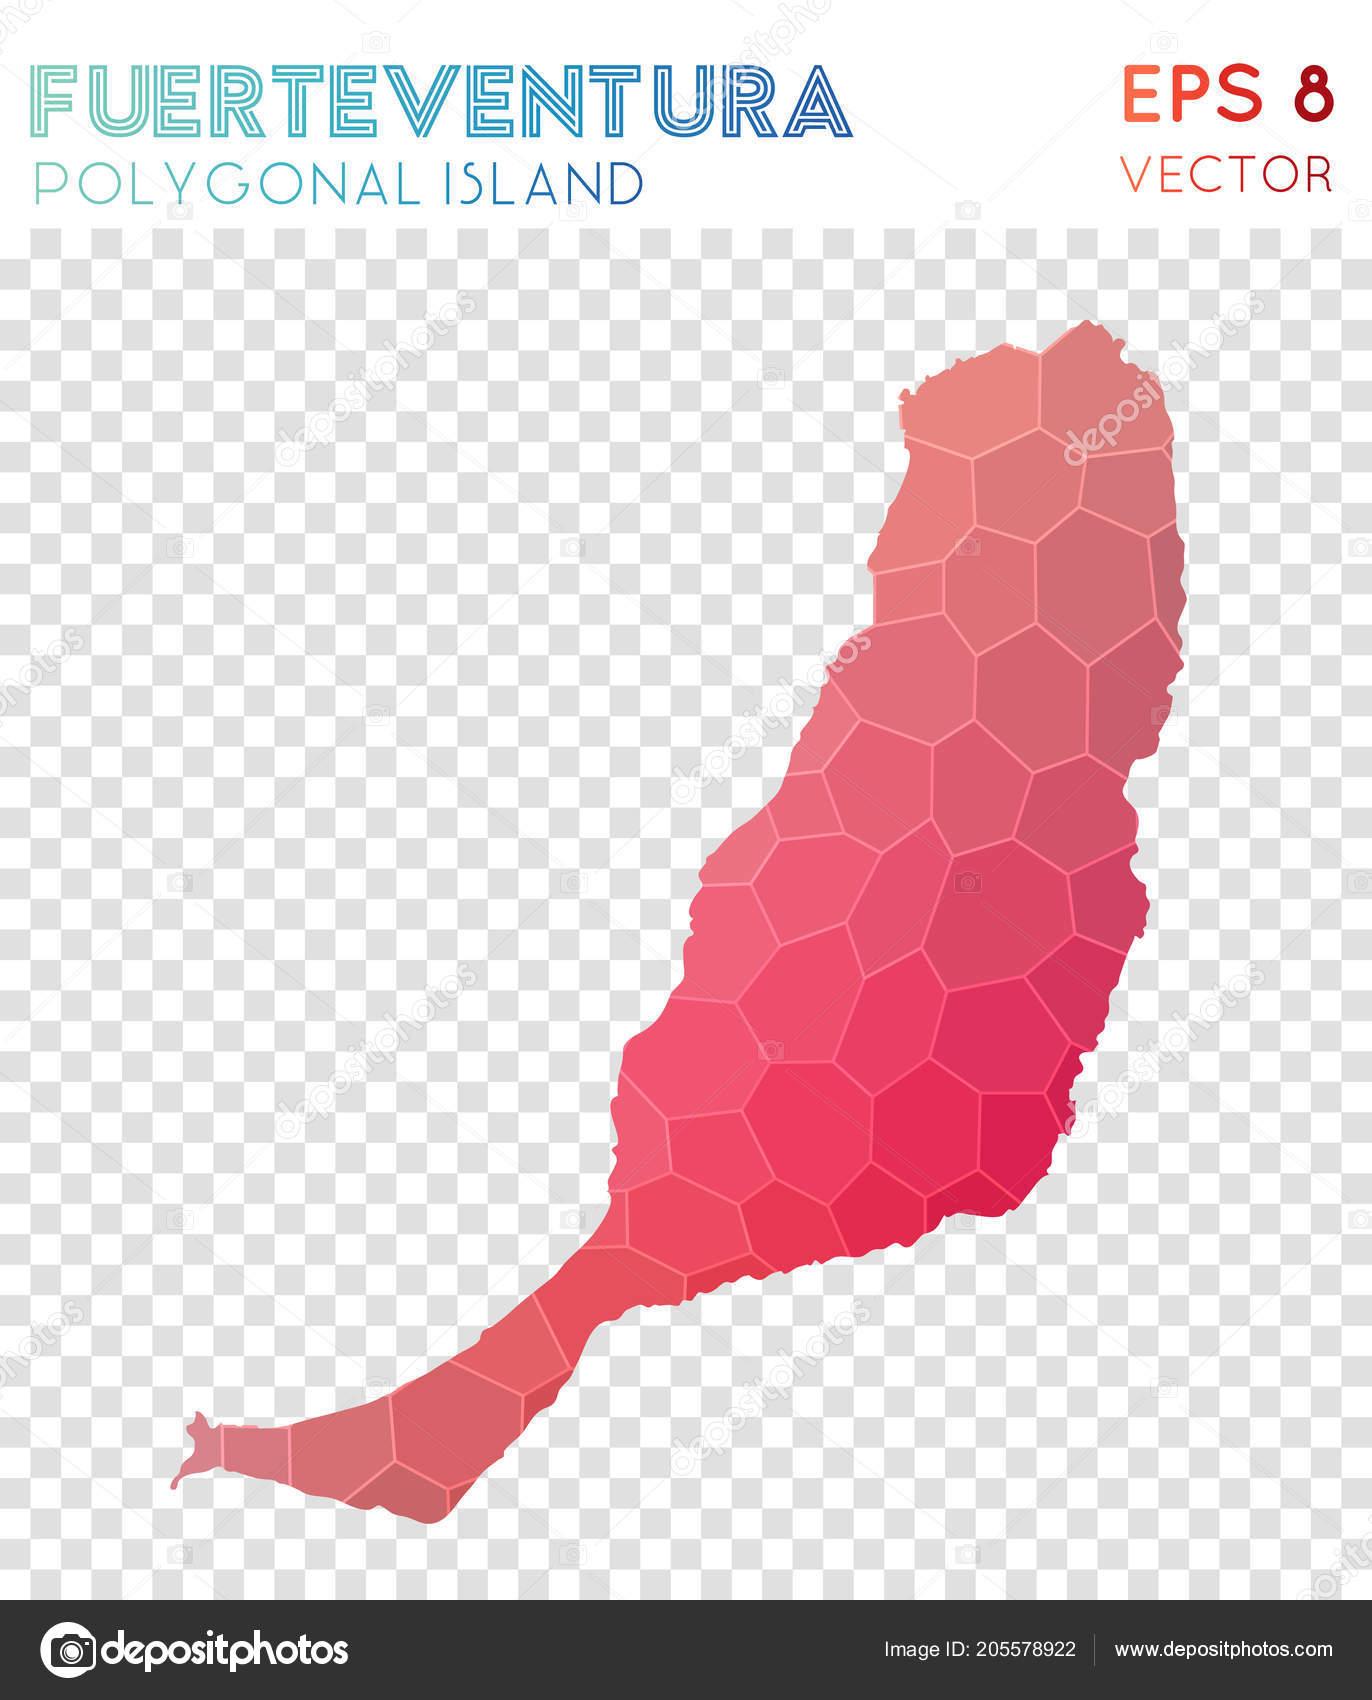 Entzuckend Fuerteventura Polygonal Map Mosaic Style Island Pleasant Low Poly Style  Modern Design U2014 Vetores De Stock